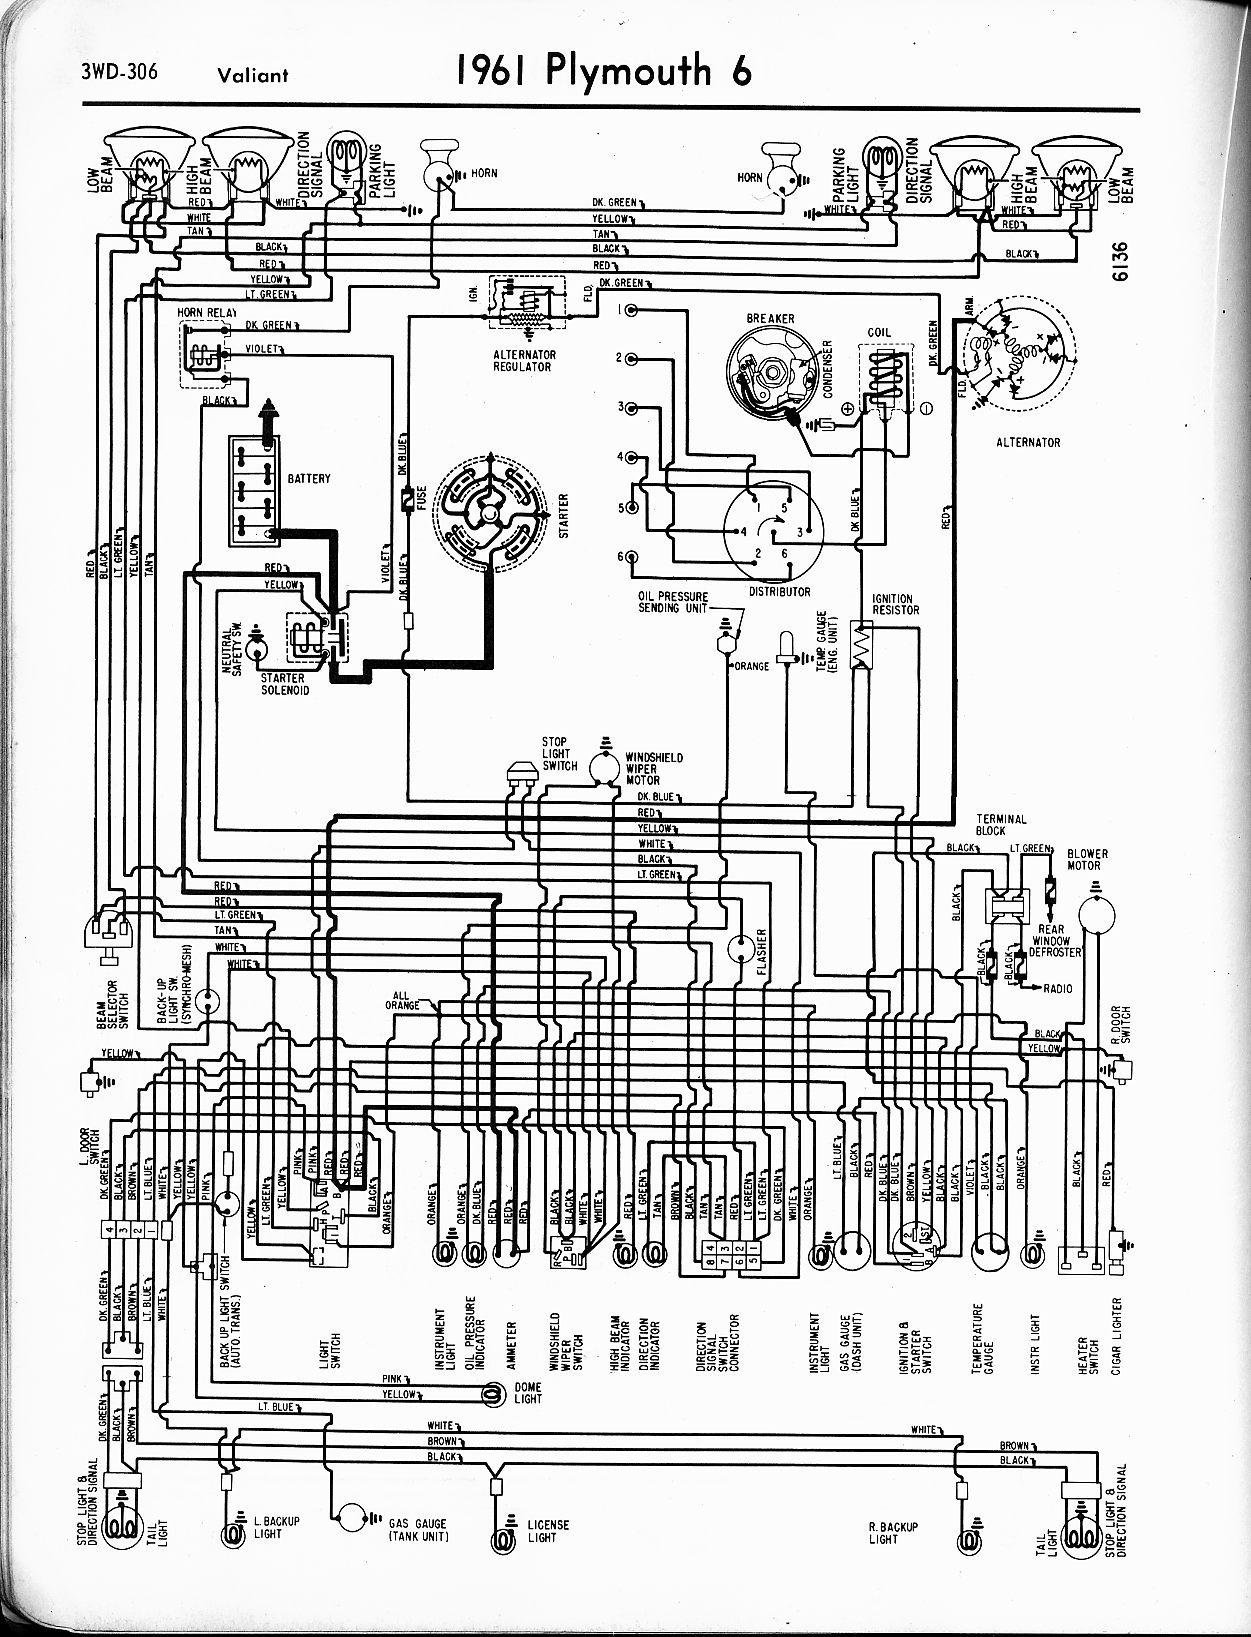 Diagram 71 Plymouth Gtx Wiring Diagram Full Version Hd Quality Wiring Diagram Sato Yti Fr